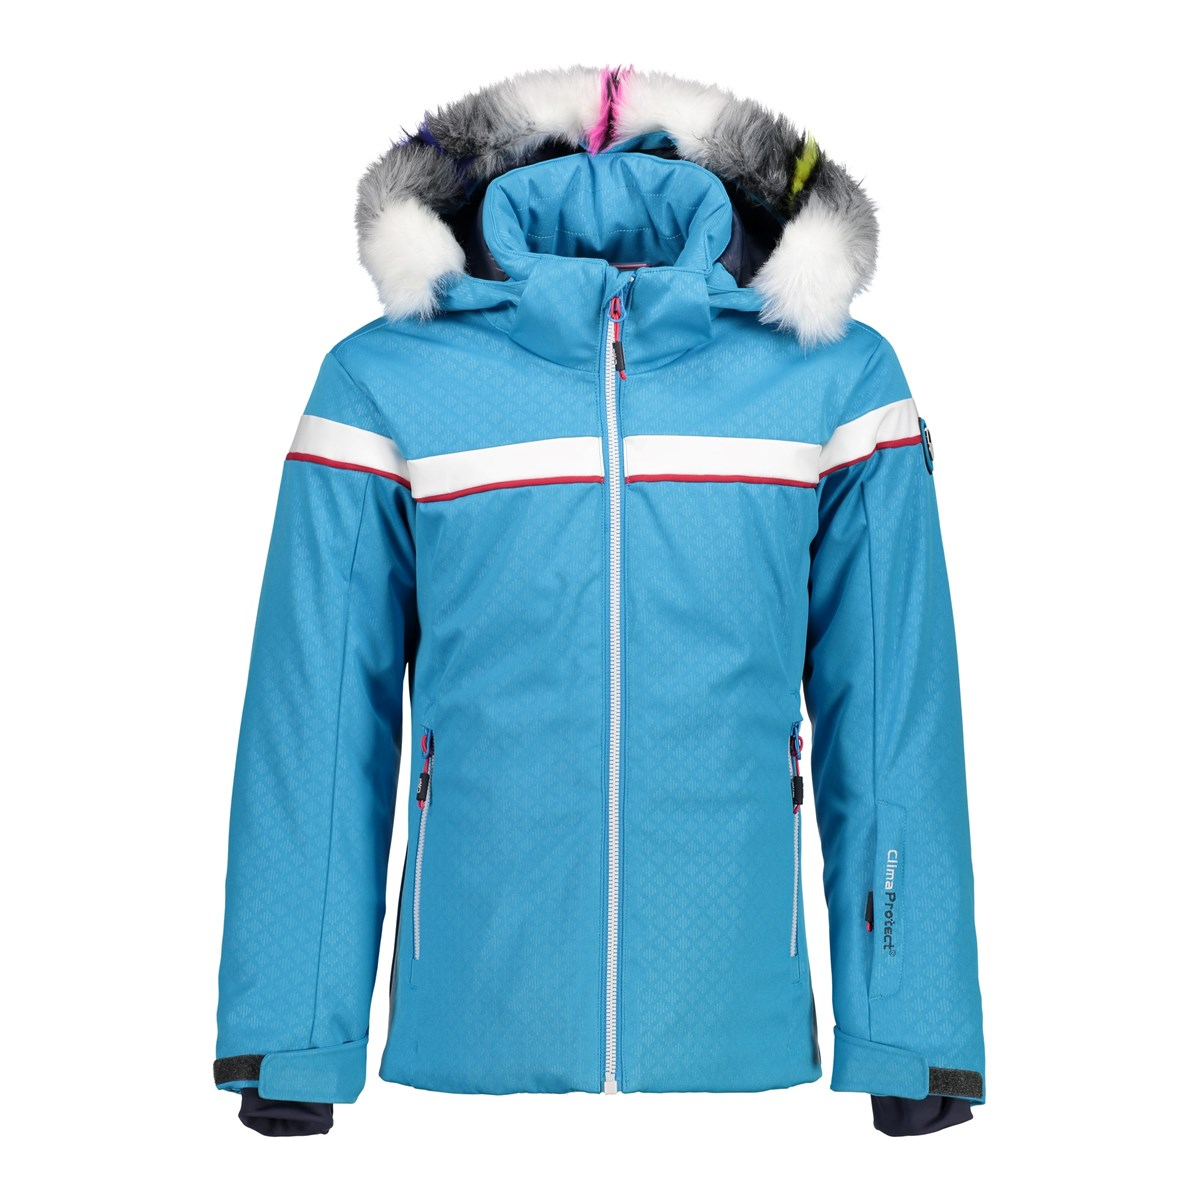 a595ddabc CMP Disco Junior Girls Ski Jacket 2019 Jewel Blue £85.00